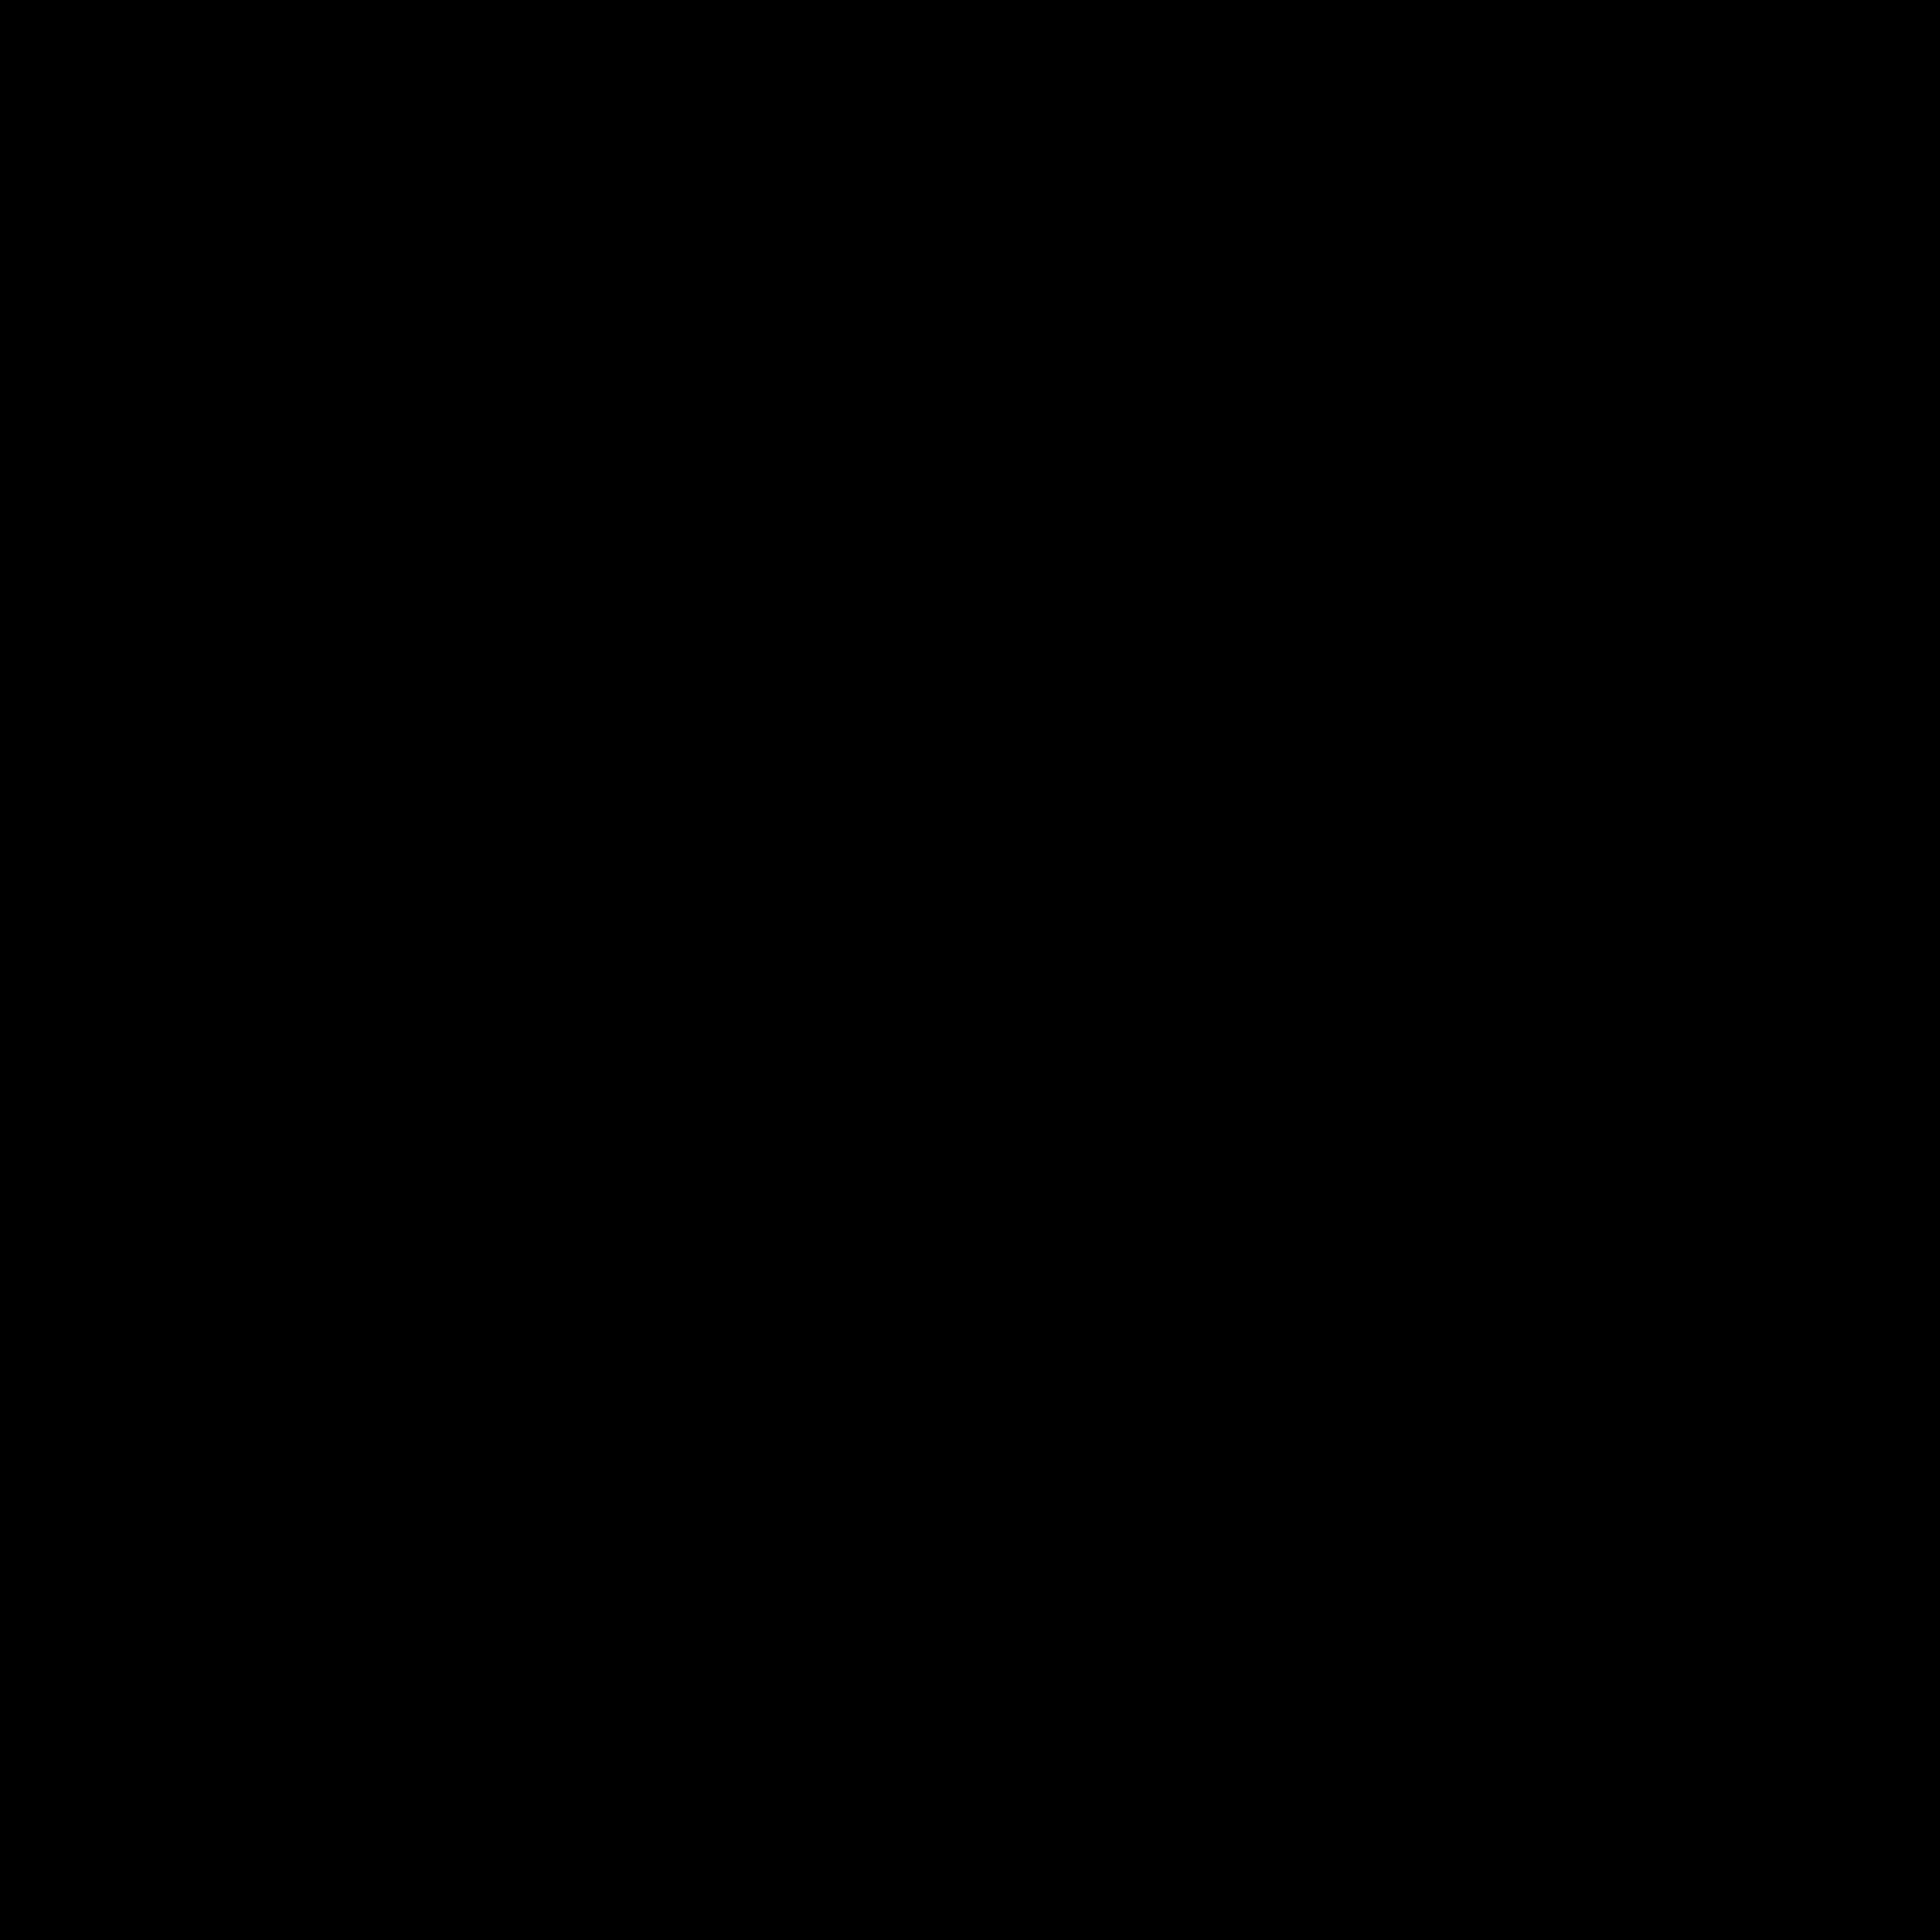 NAPA Logo PNG Transparent & SVG Vector - Freebie Supply